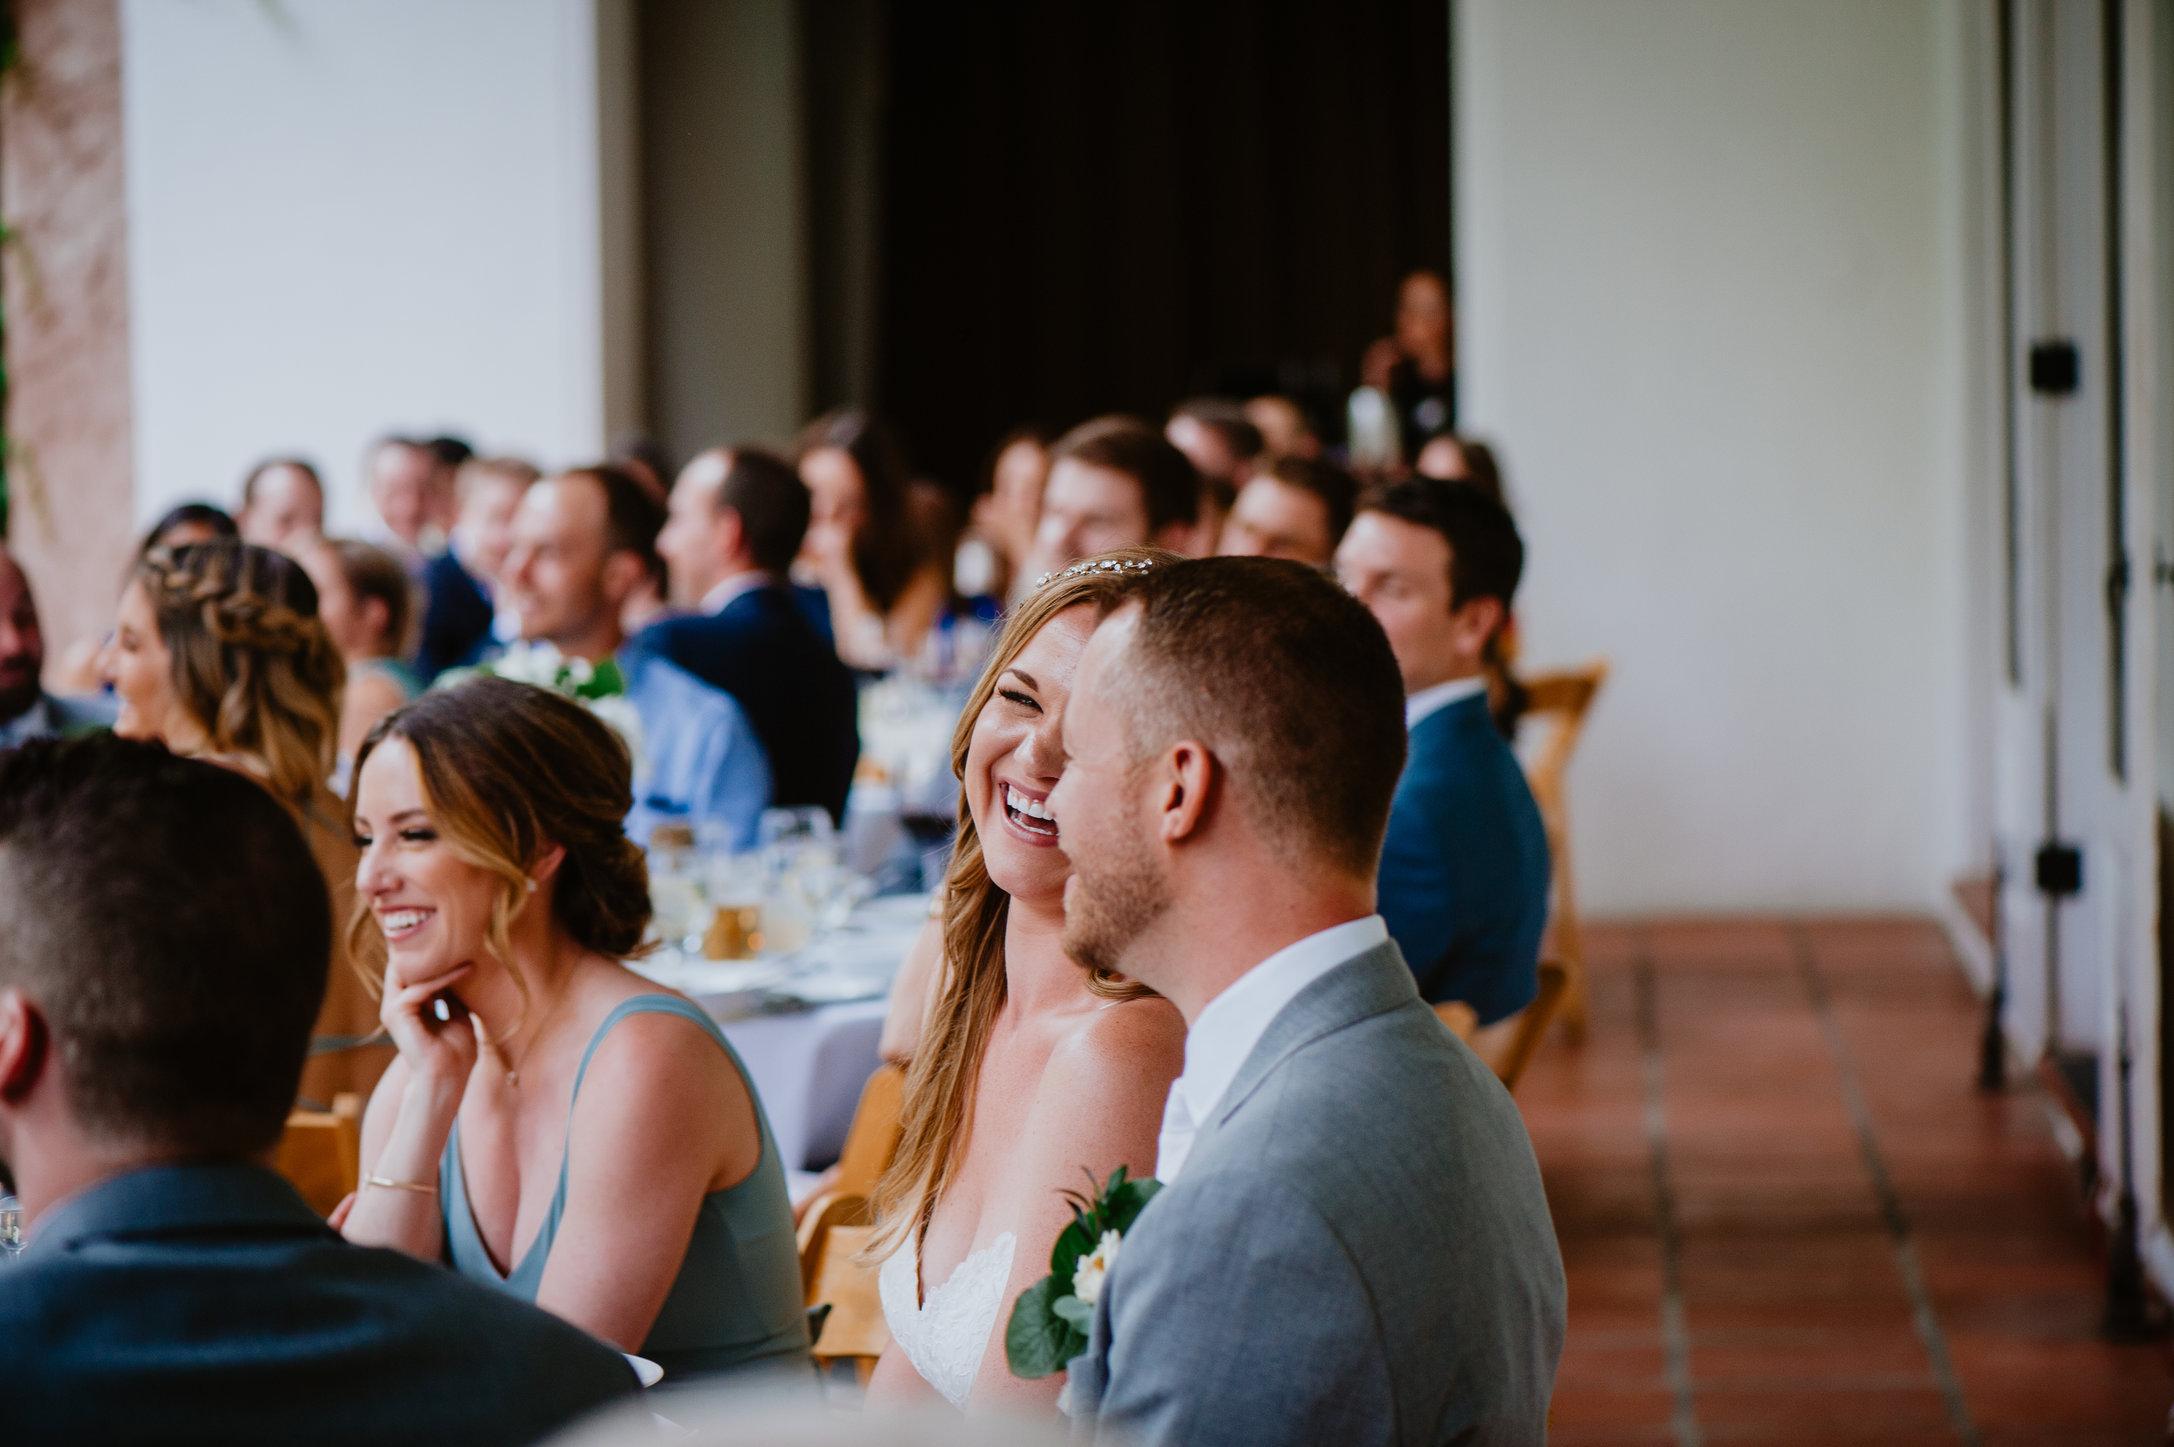 DandA-wedding-589.jpg